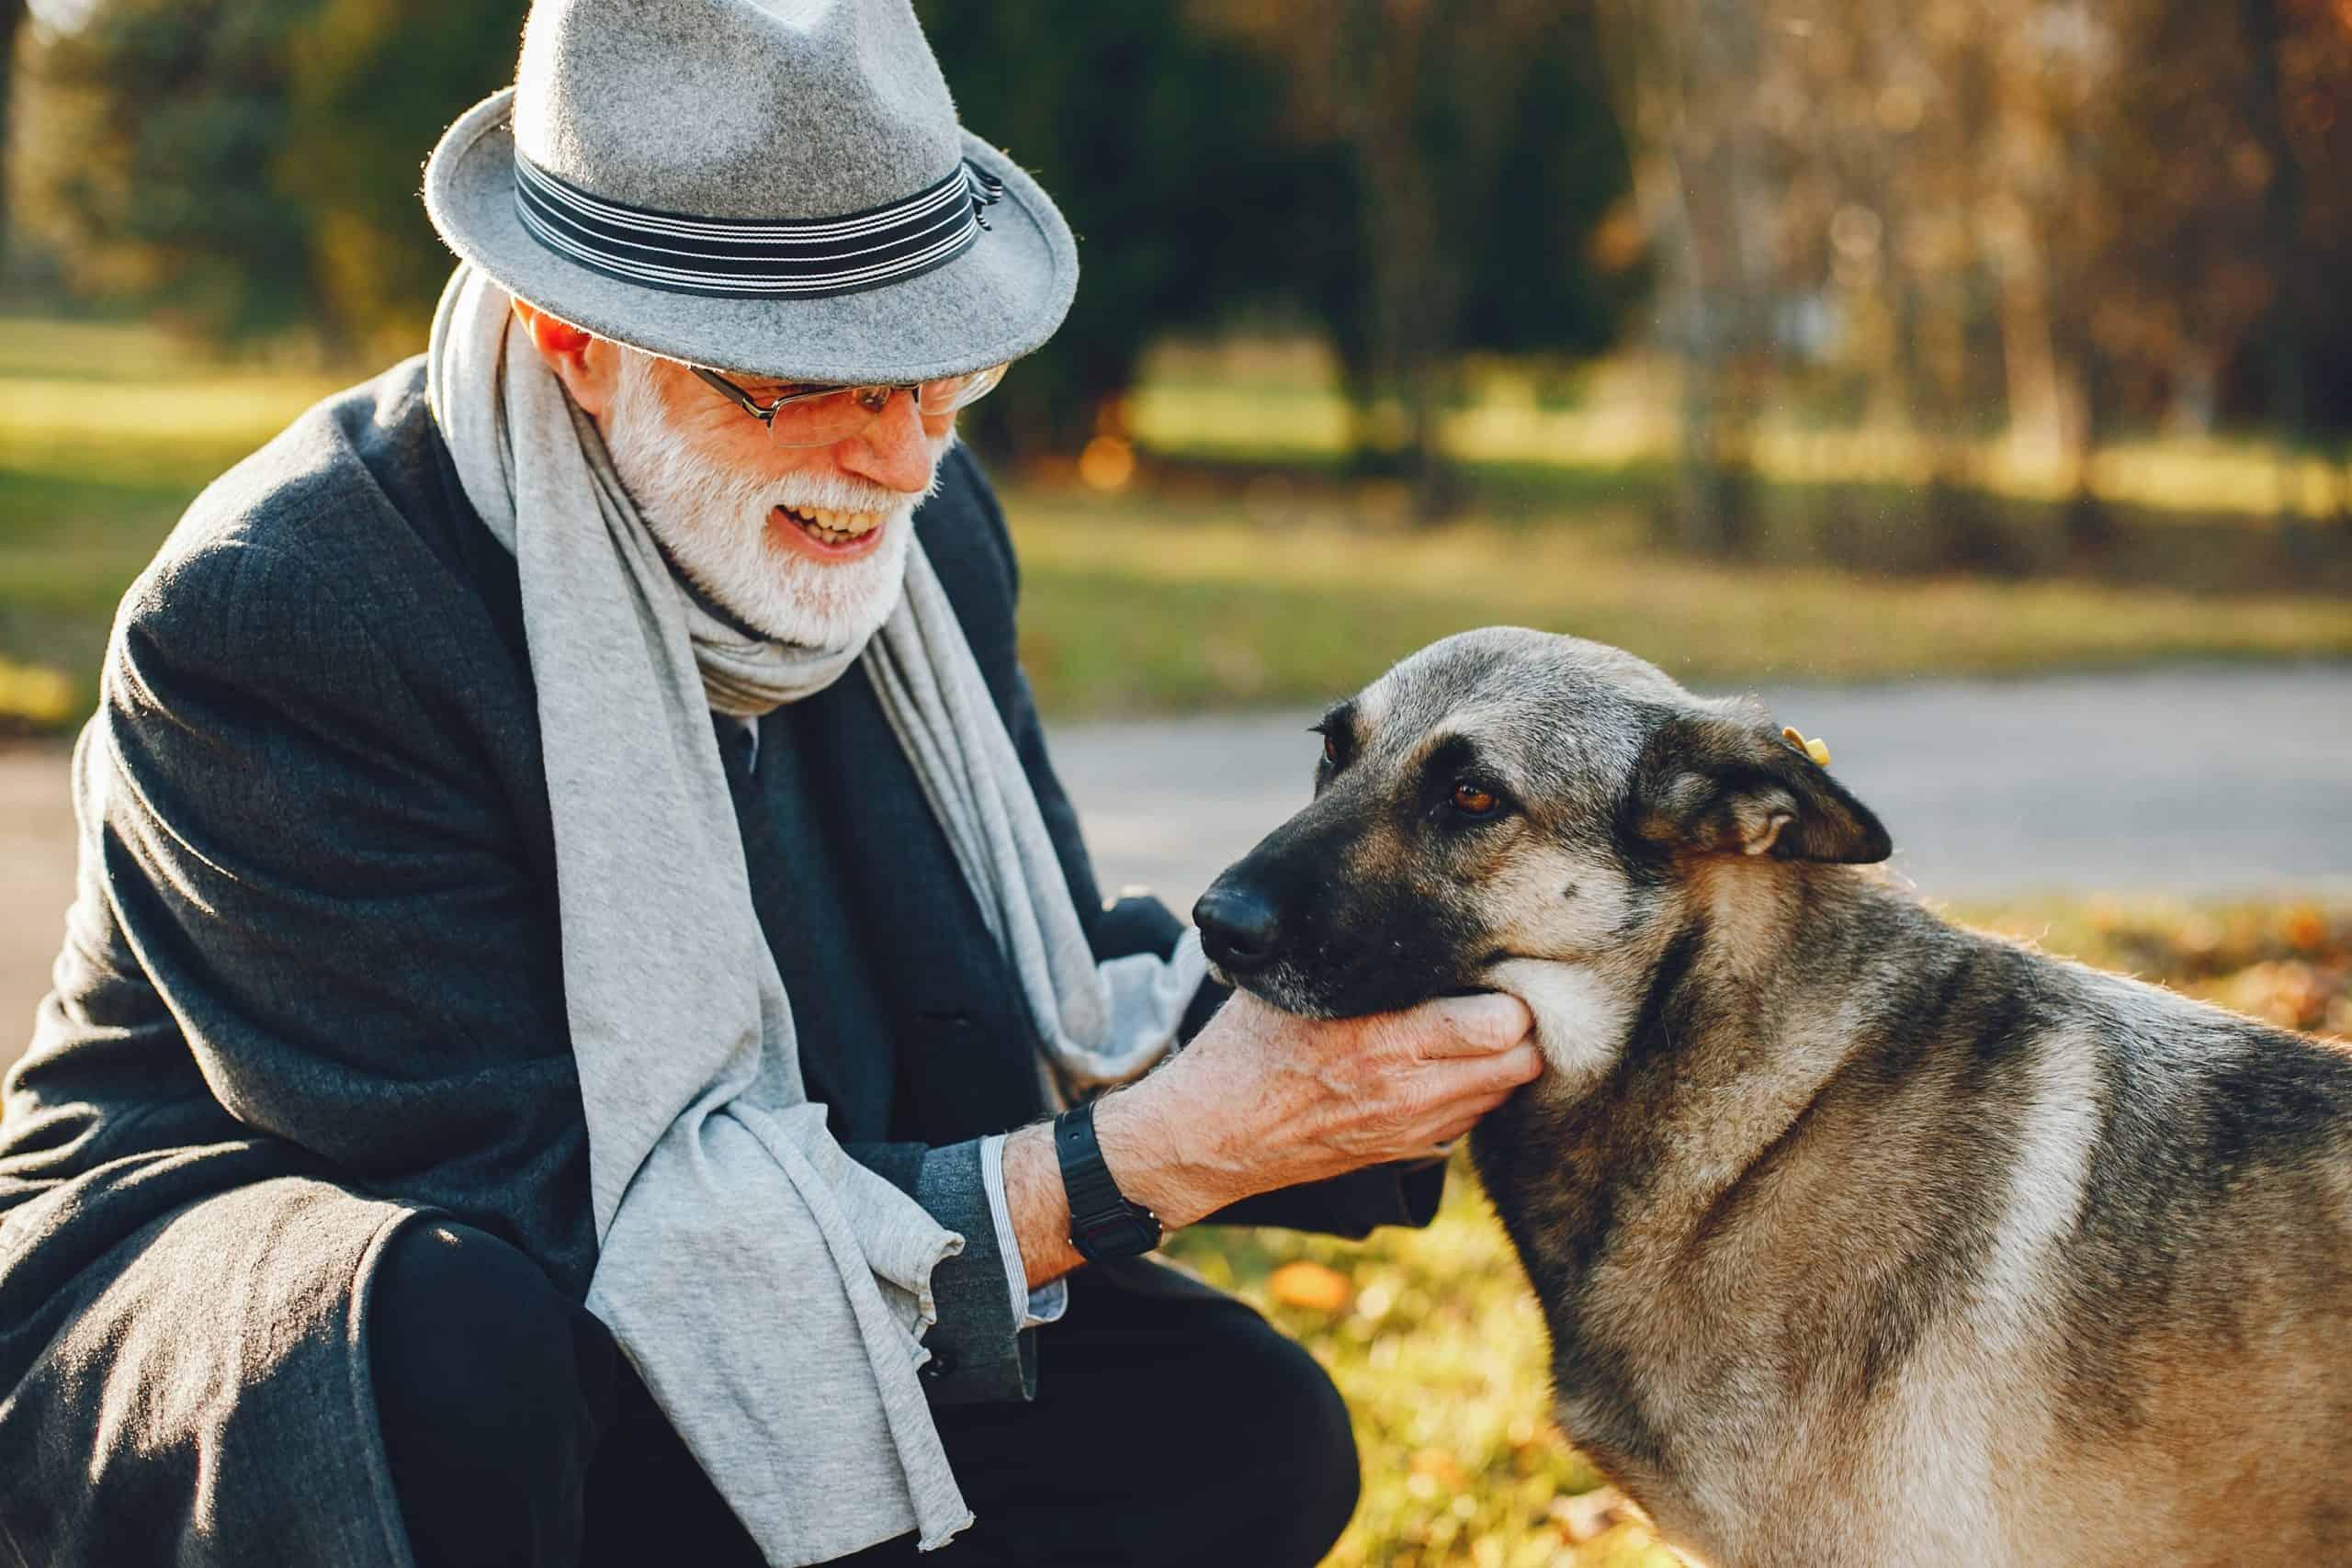 Older man pets dog. Make sure senior dogs get daily exercise.